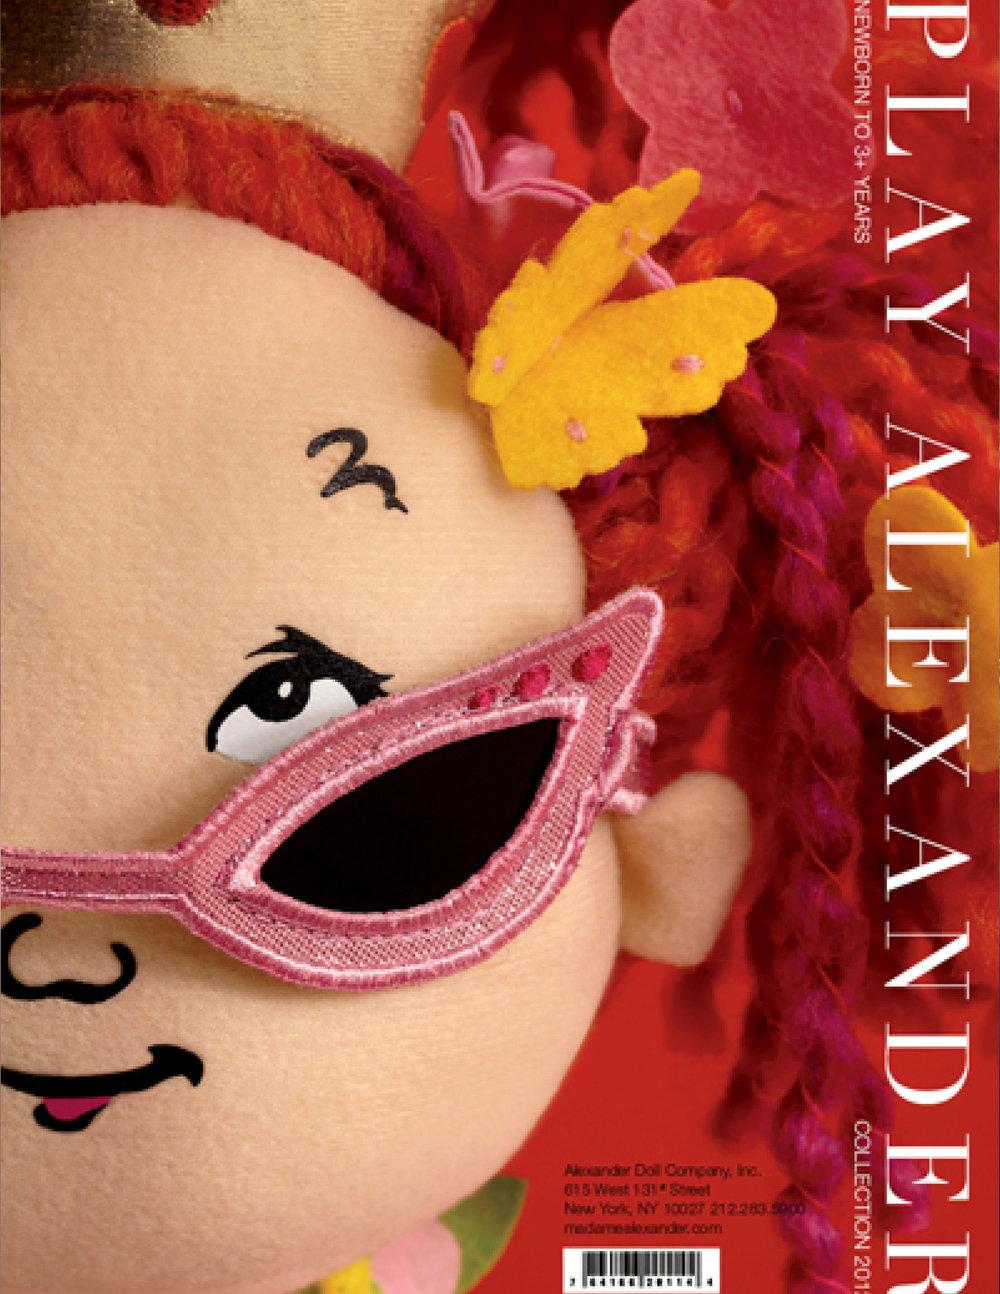 Copy of 2012 Play Catalog